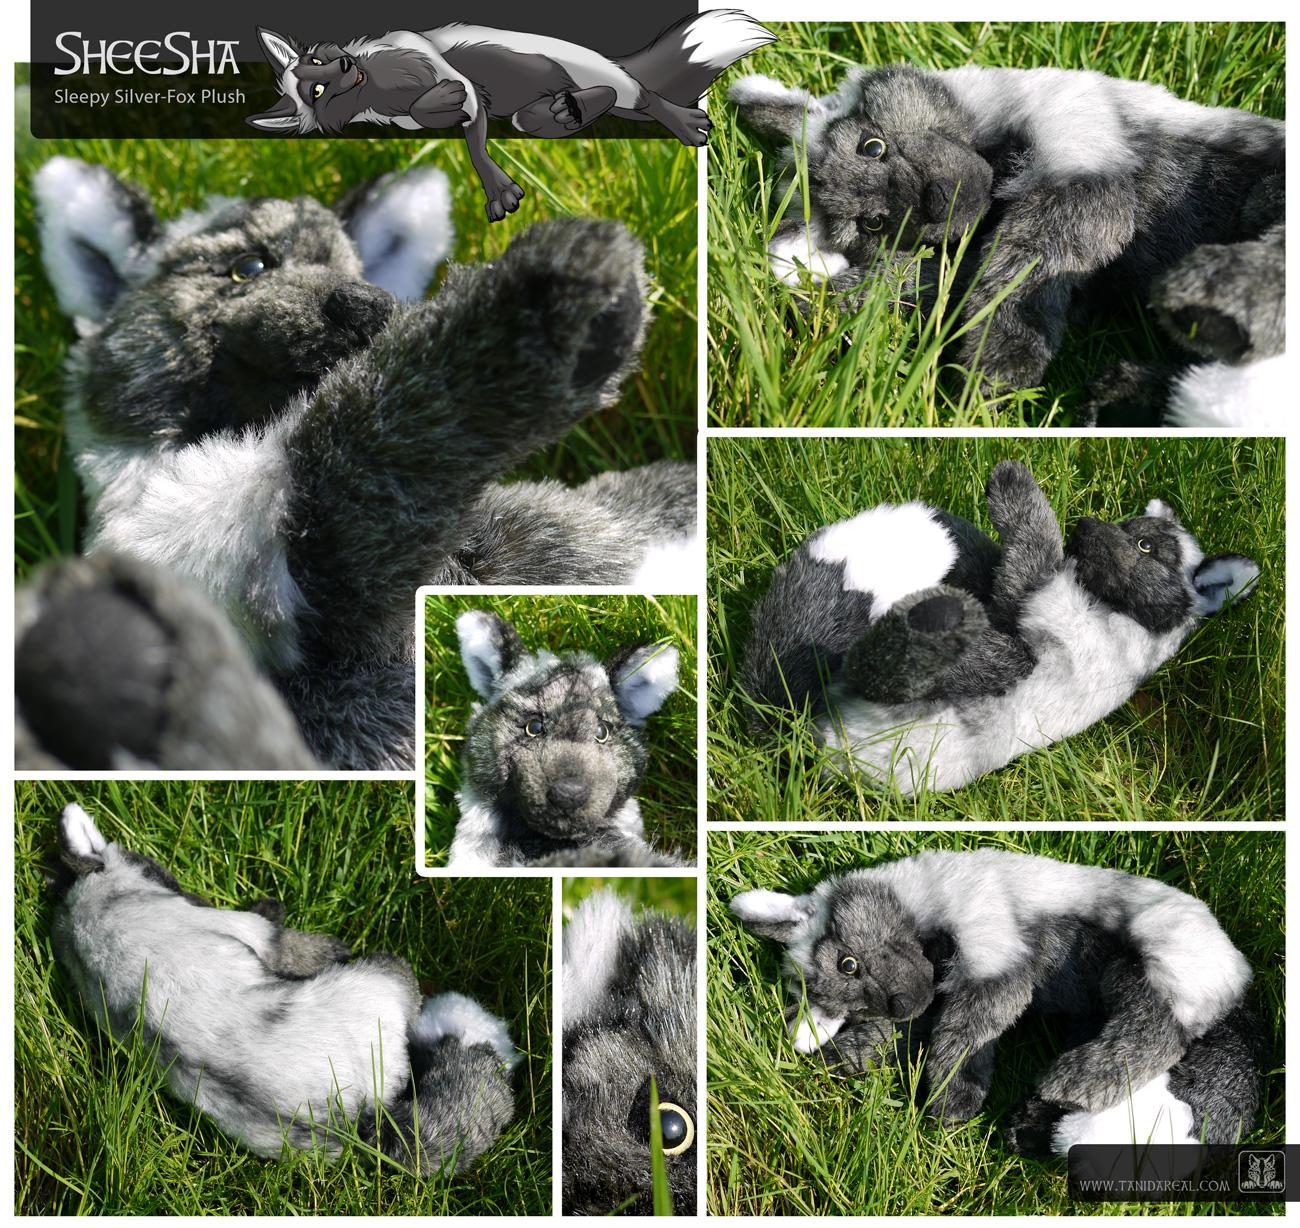 Silver Fox Stuffed Animal, Sheesha The Silver Fox Plush Weasyl